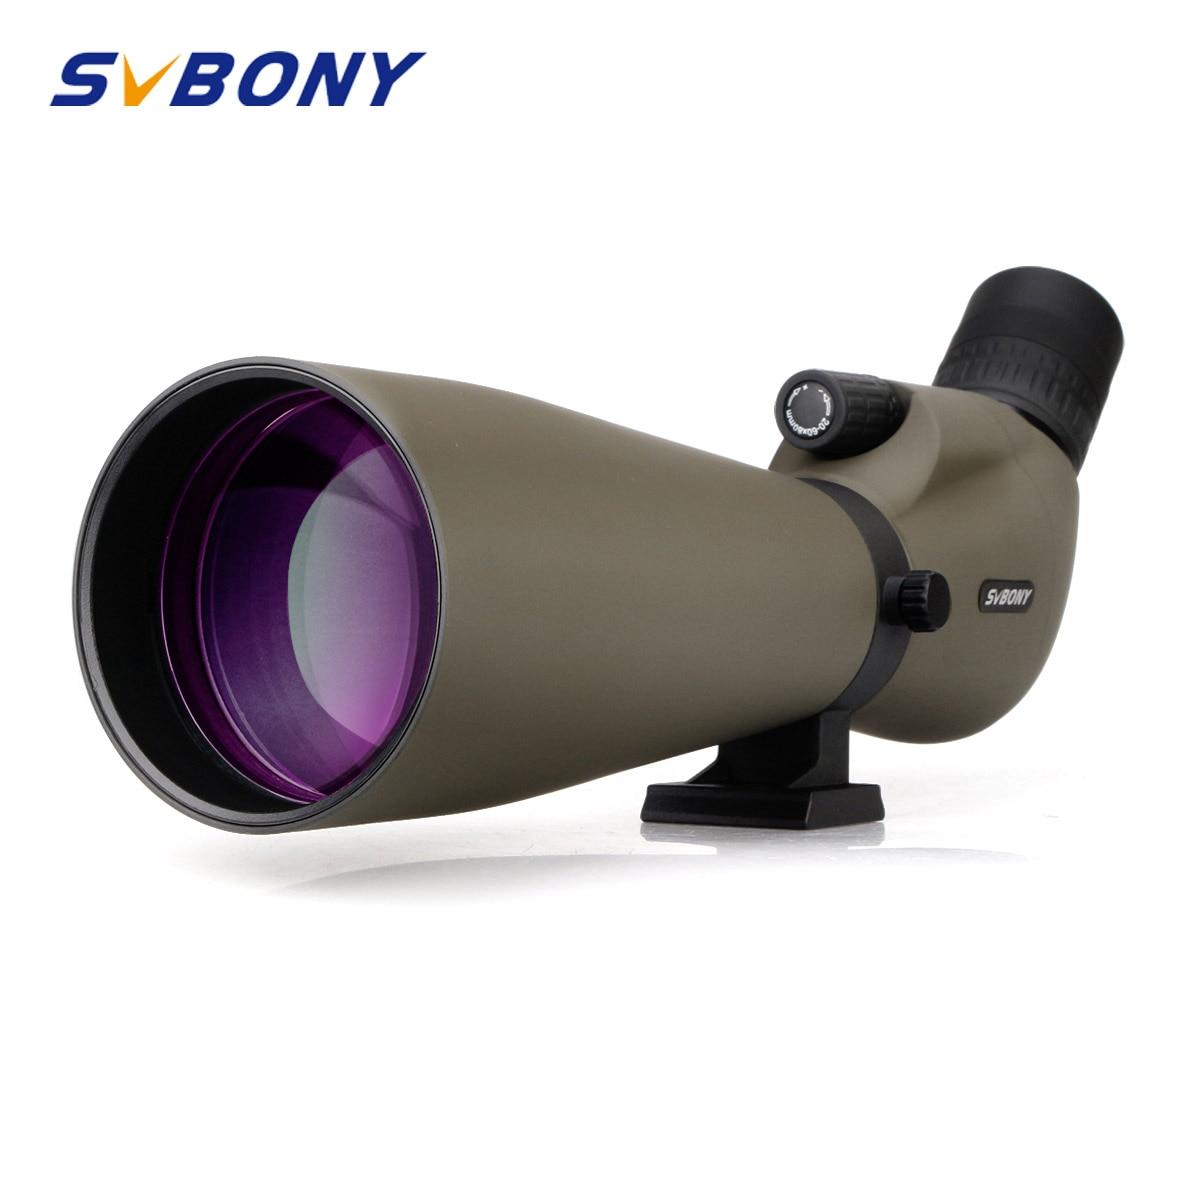 Svbony Spotting Scope 20-60x80 Zoom Monocular Telescope Multi-Coated Optics Refractor Spyglass Telescope Waterproof w/Tripod